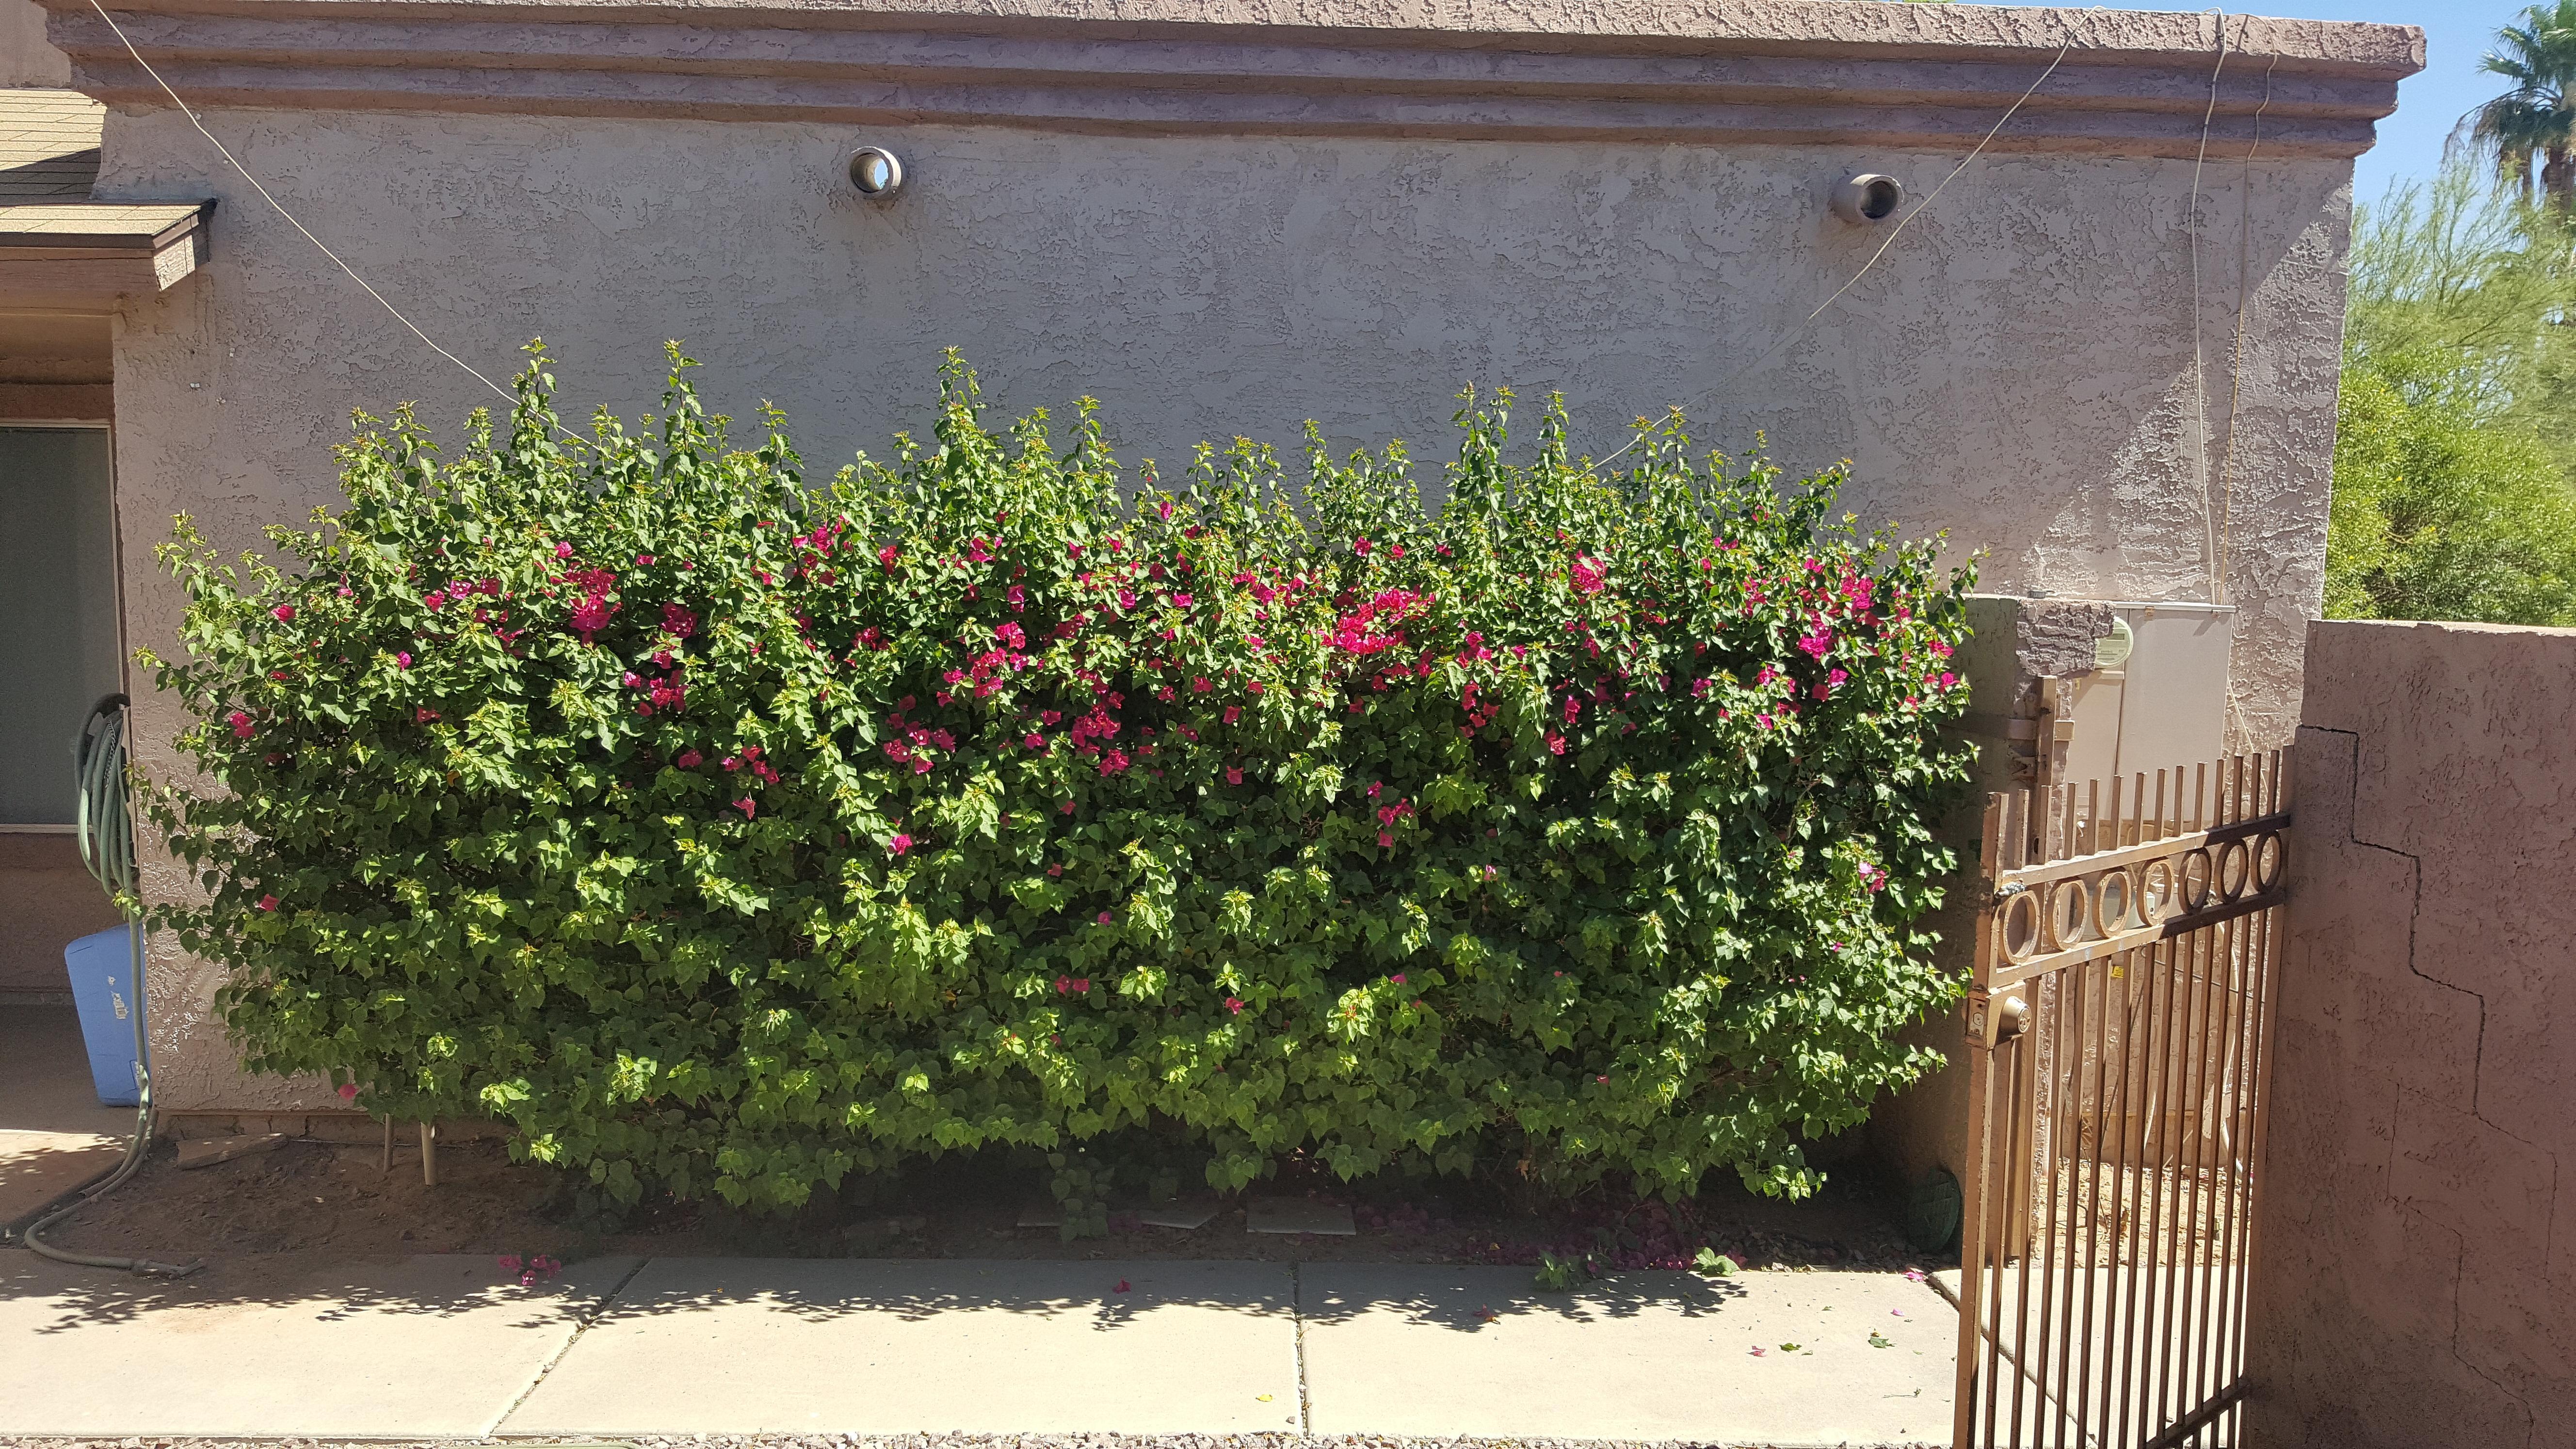 Right Choice Lawn Service In Maricopa AZ 85139 - ChamberofCommerce.com